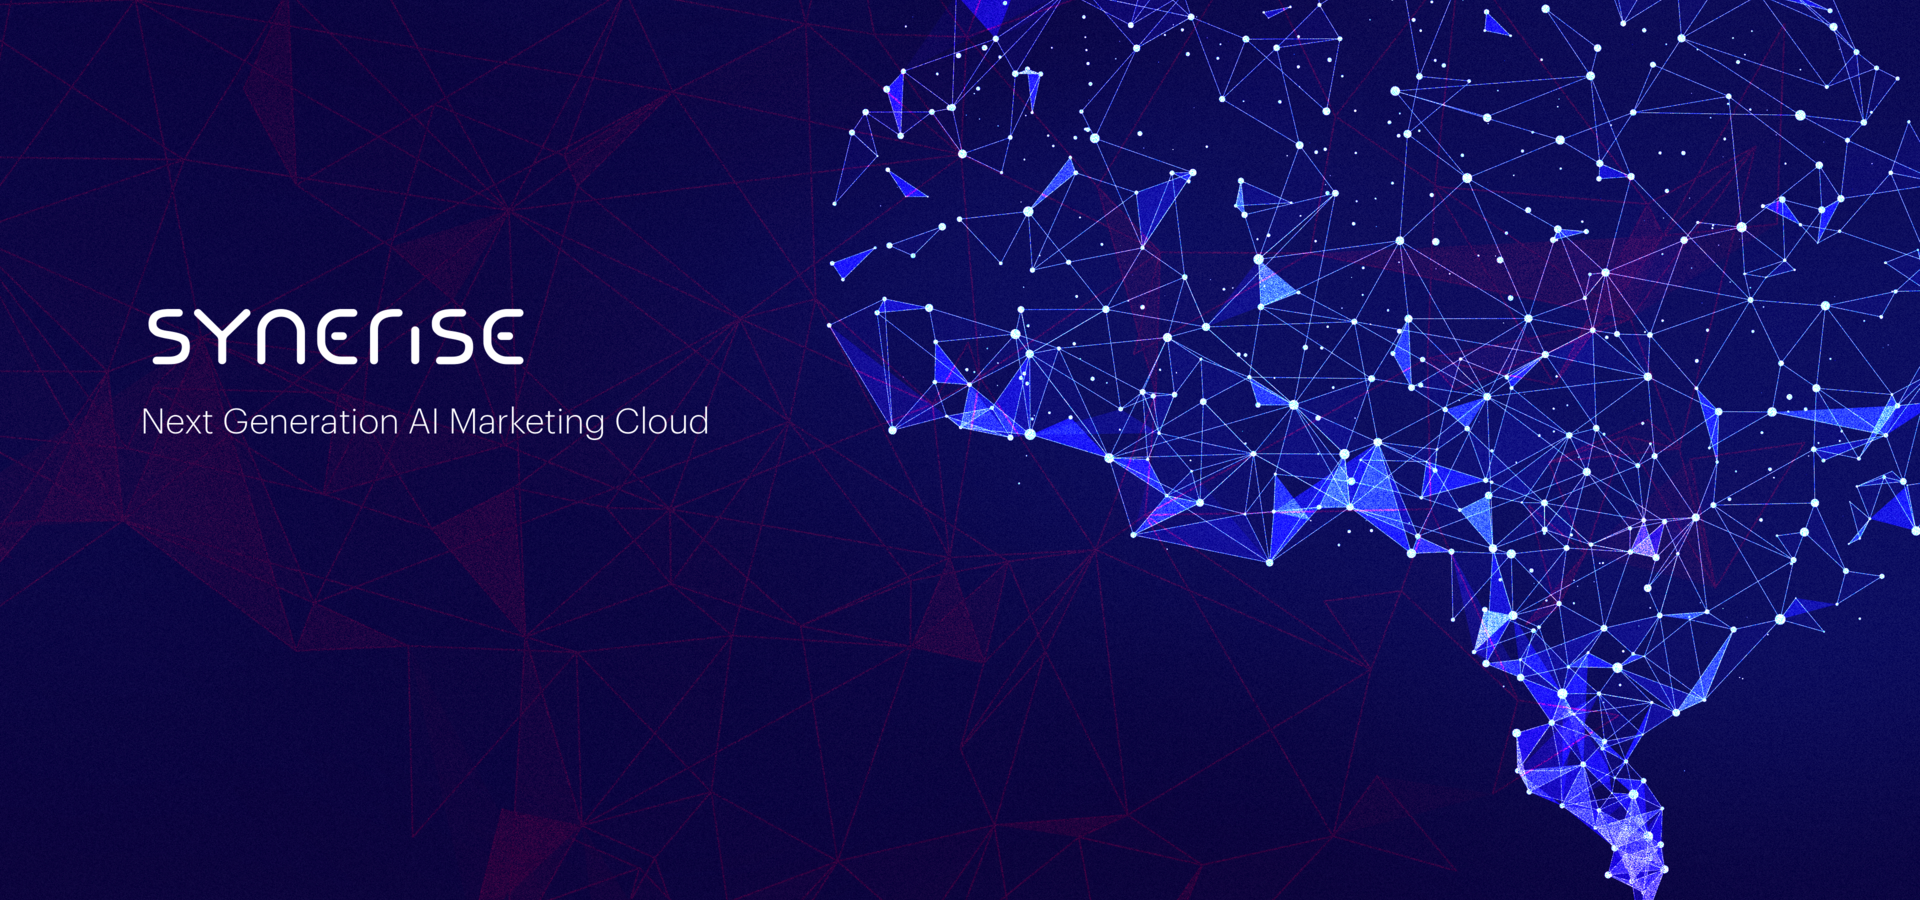 Press Kit PDF - Press Kits - Newsroom: latest news on Synerise AI Growth Cloud